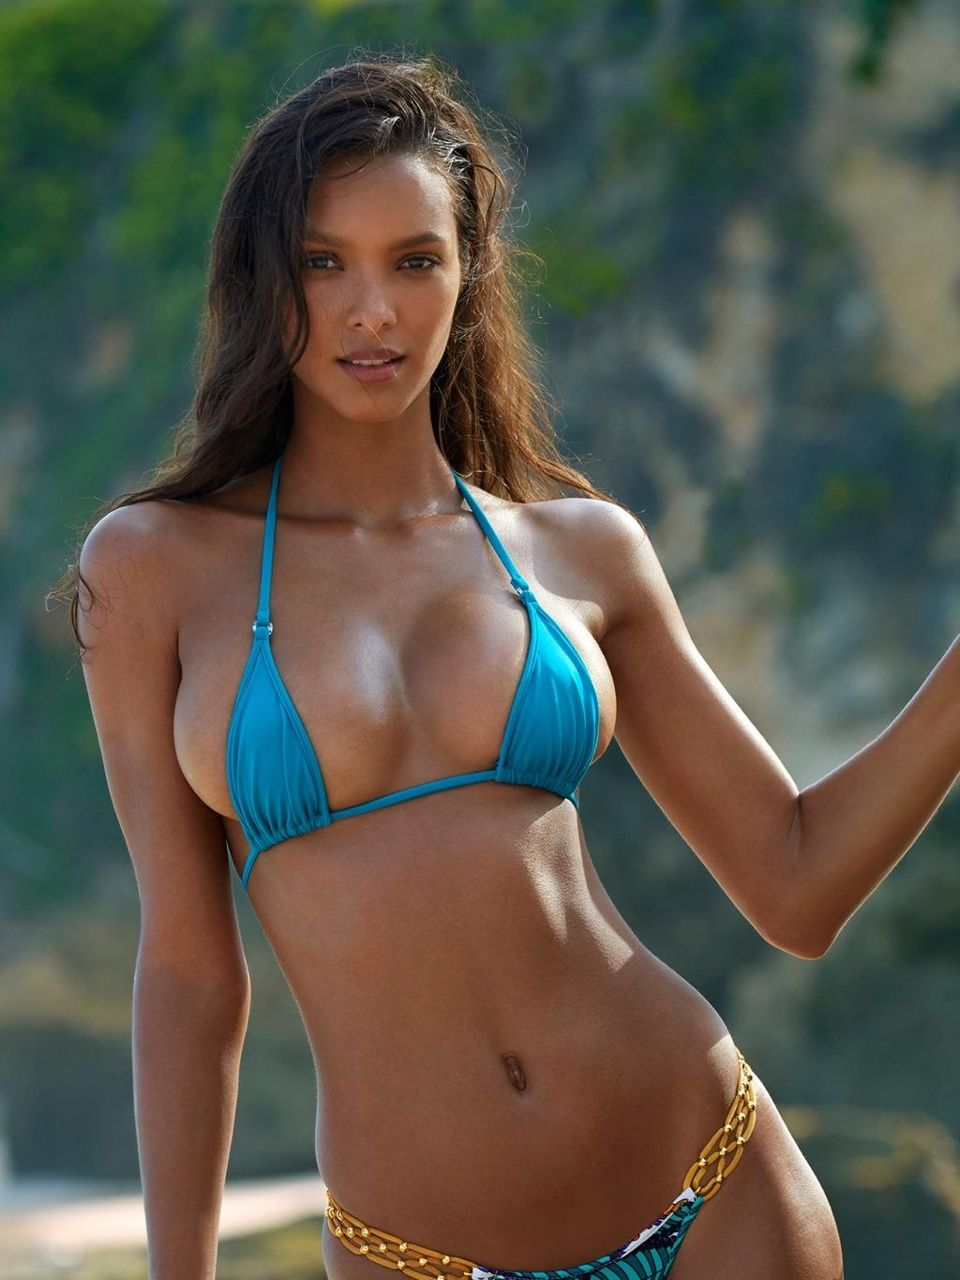 Femdom bikini beach